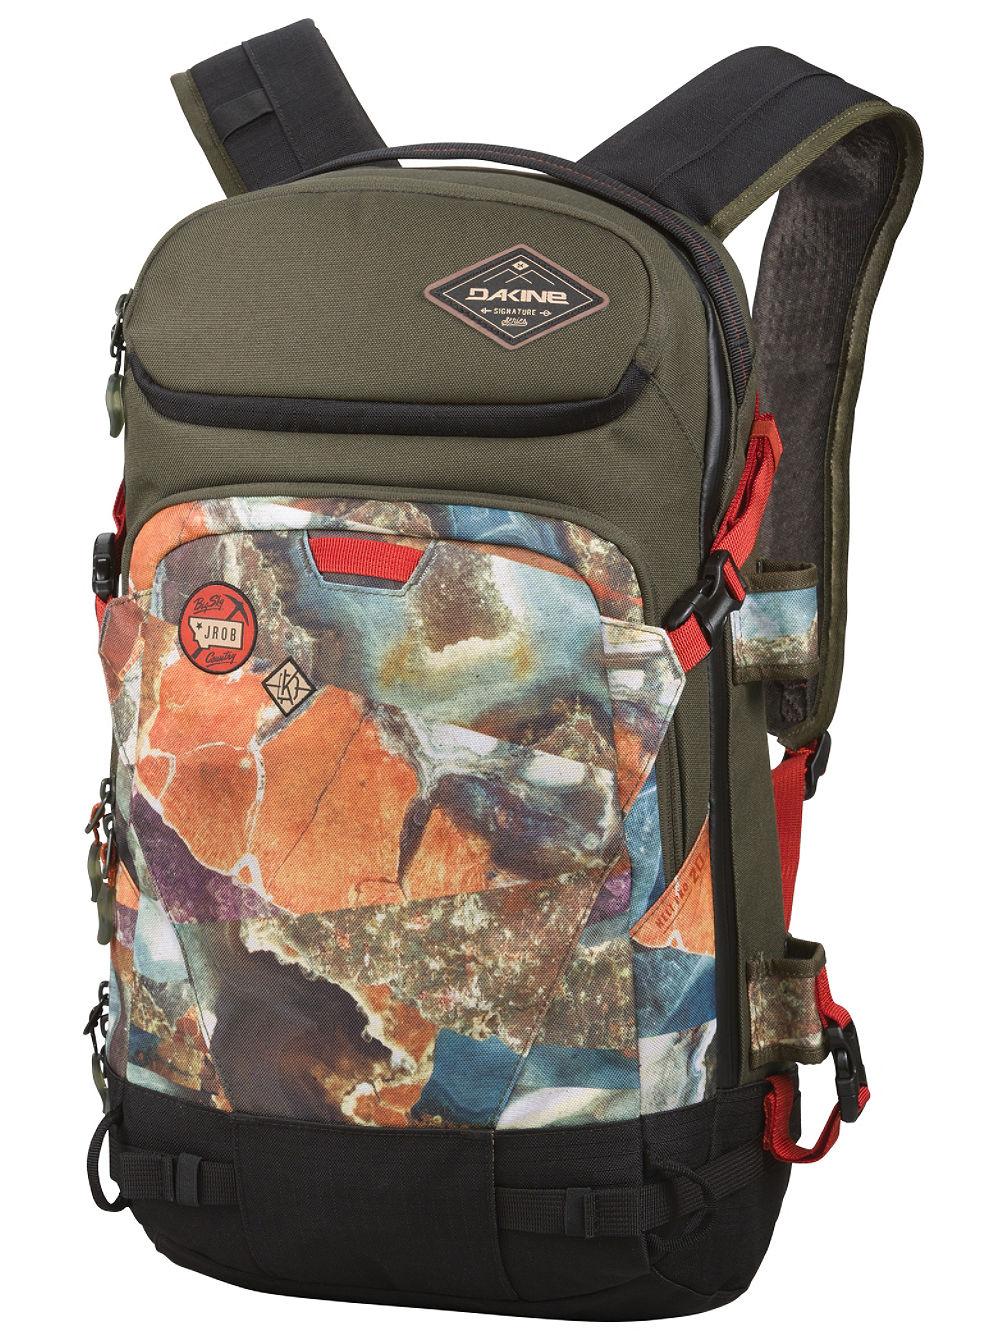 team-heli-pro-20l-backpack